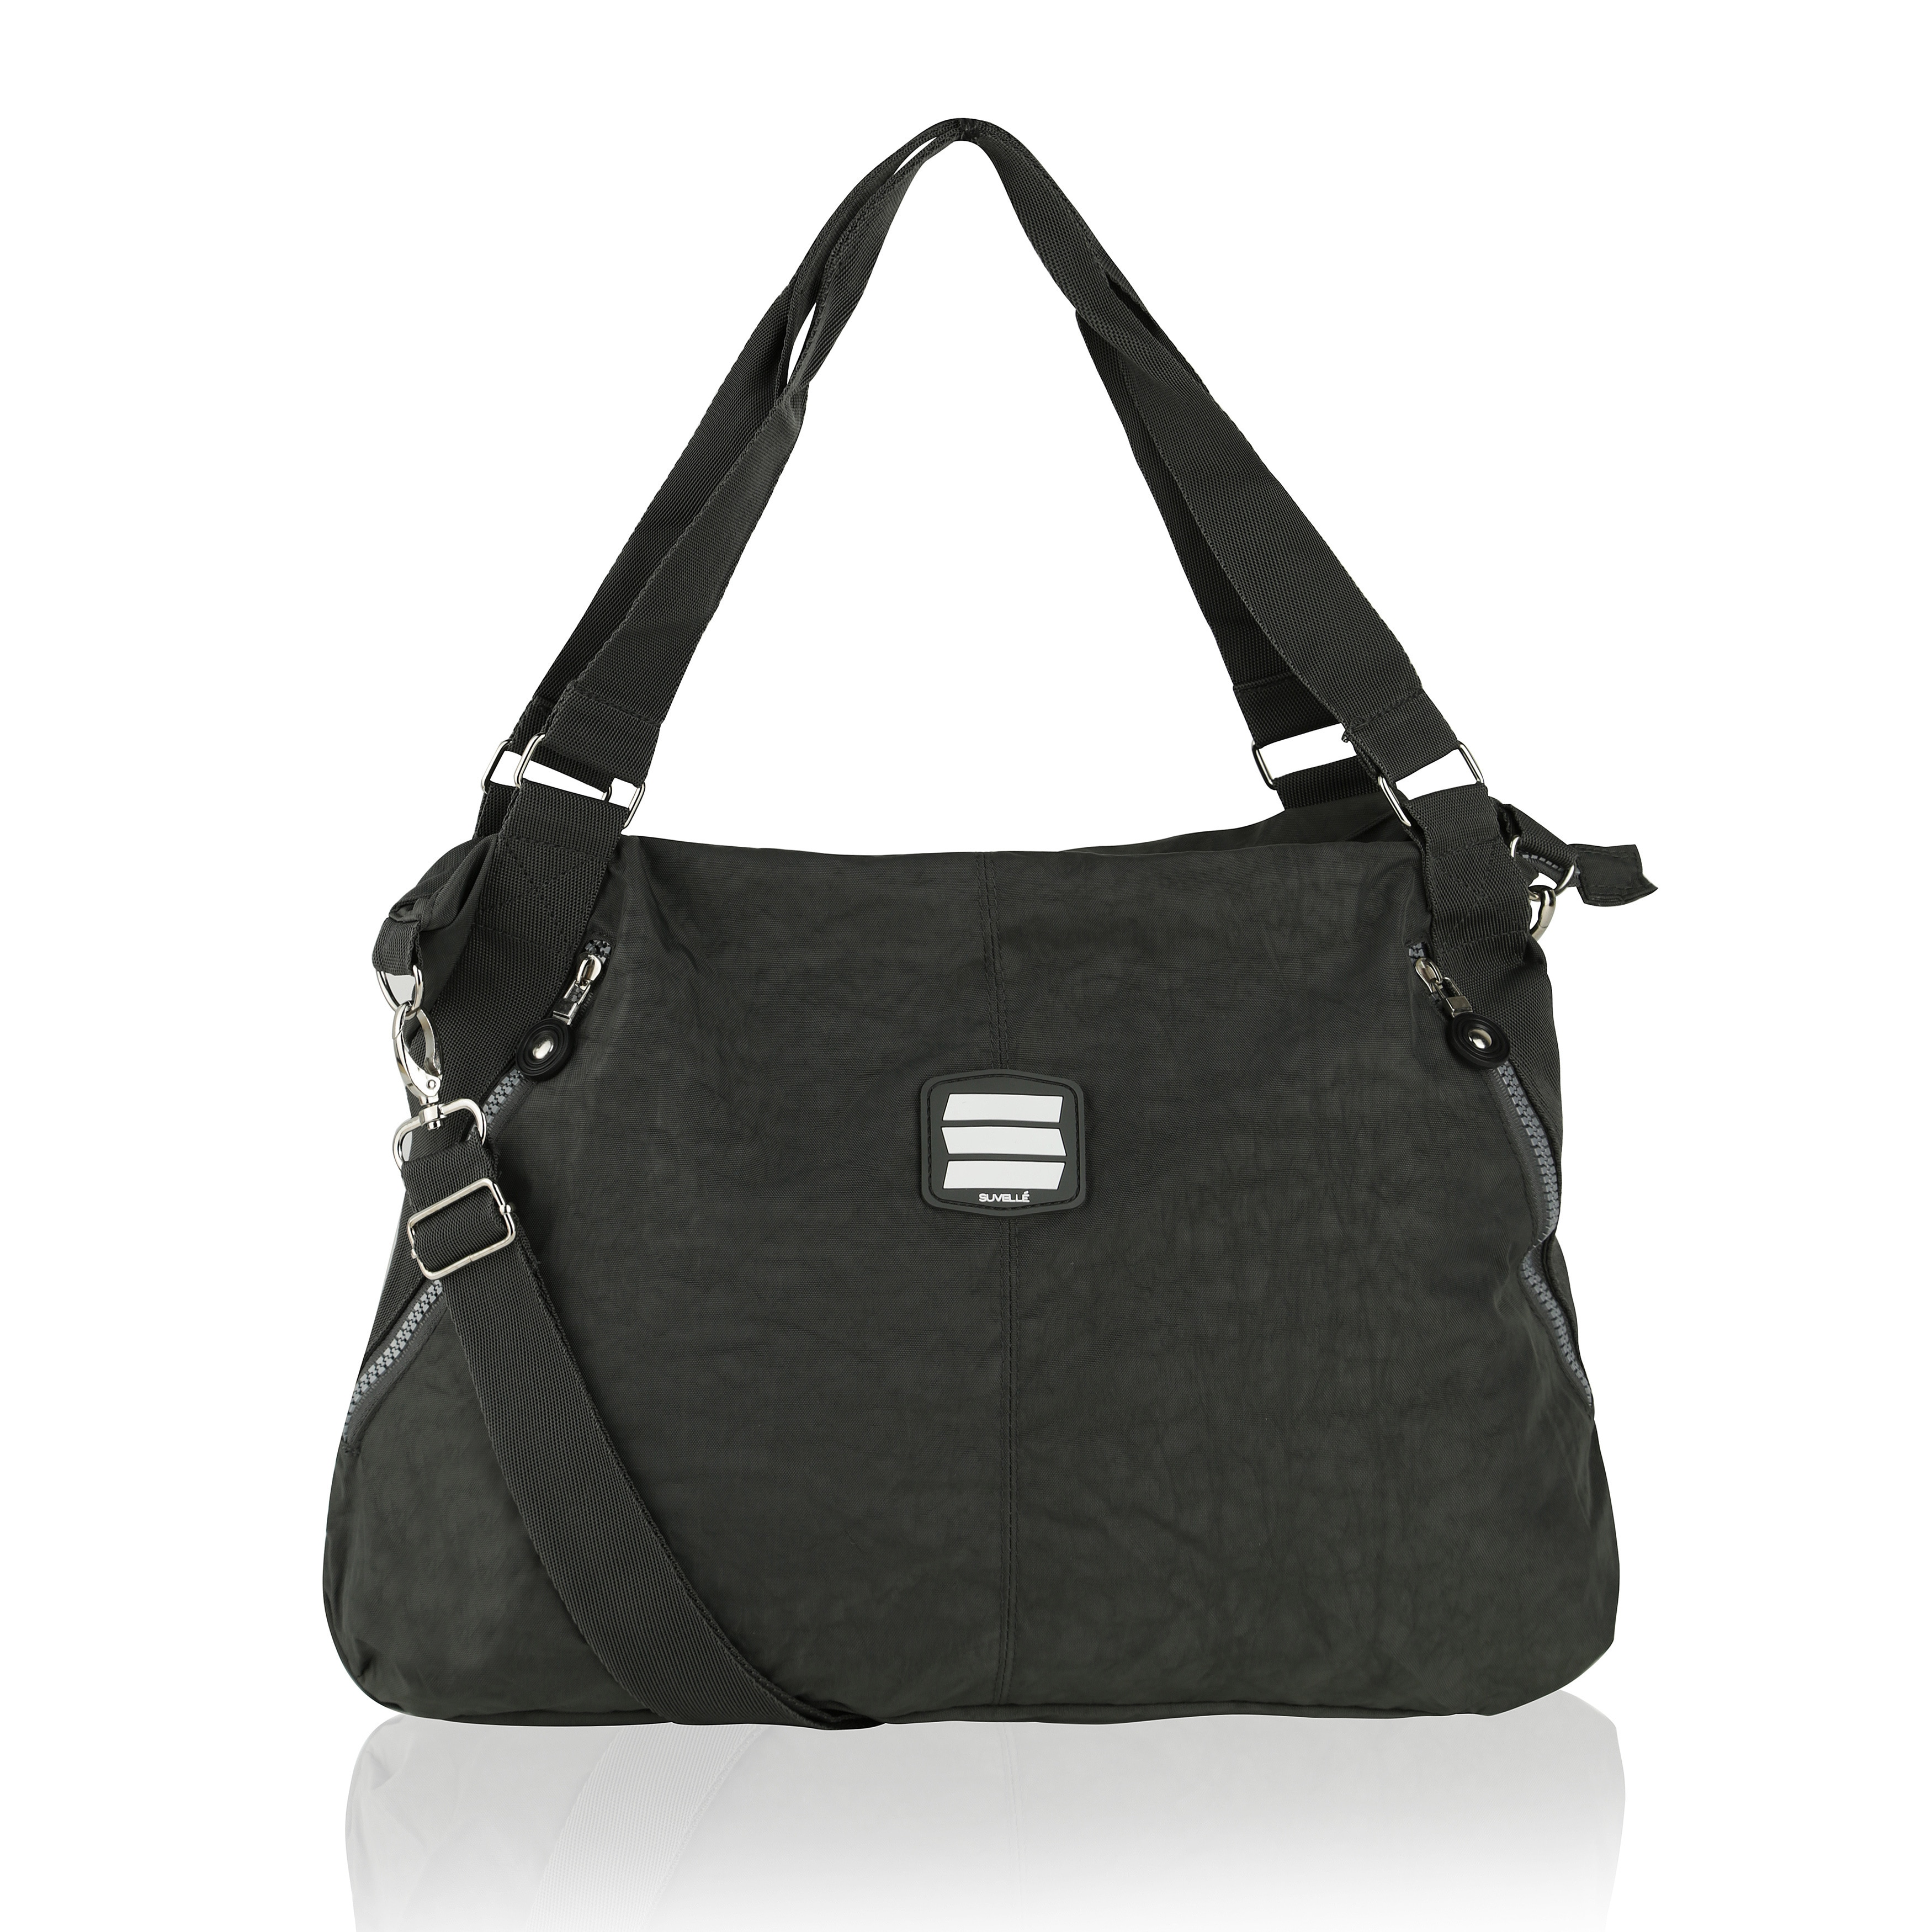 Shop Suvelle 1932 Large Tote Travel Crossbody Bag - L - Free ... 3ea4647d823